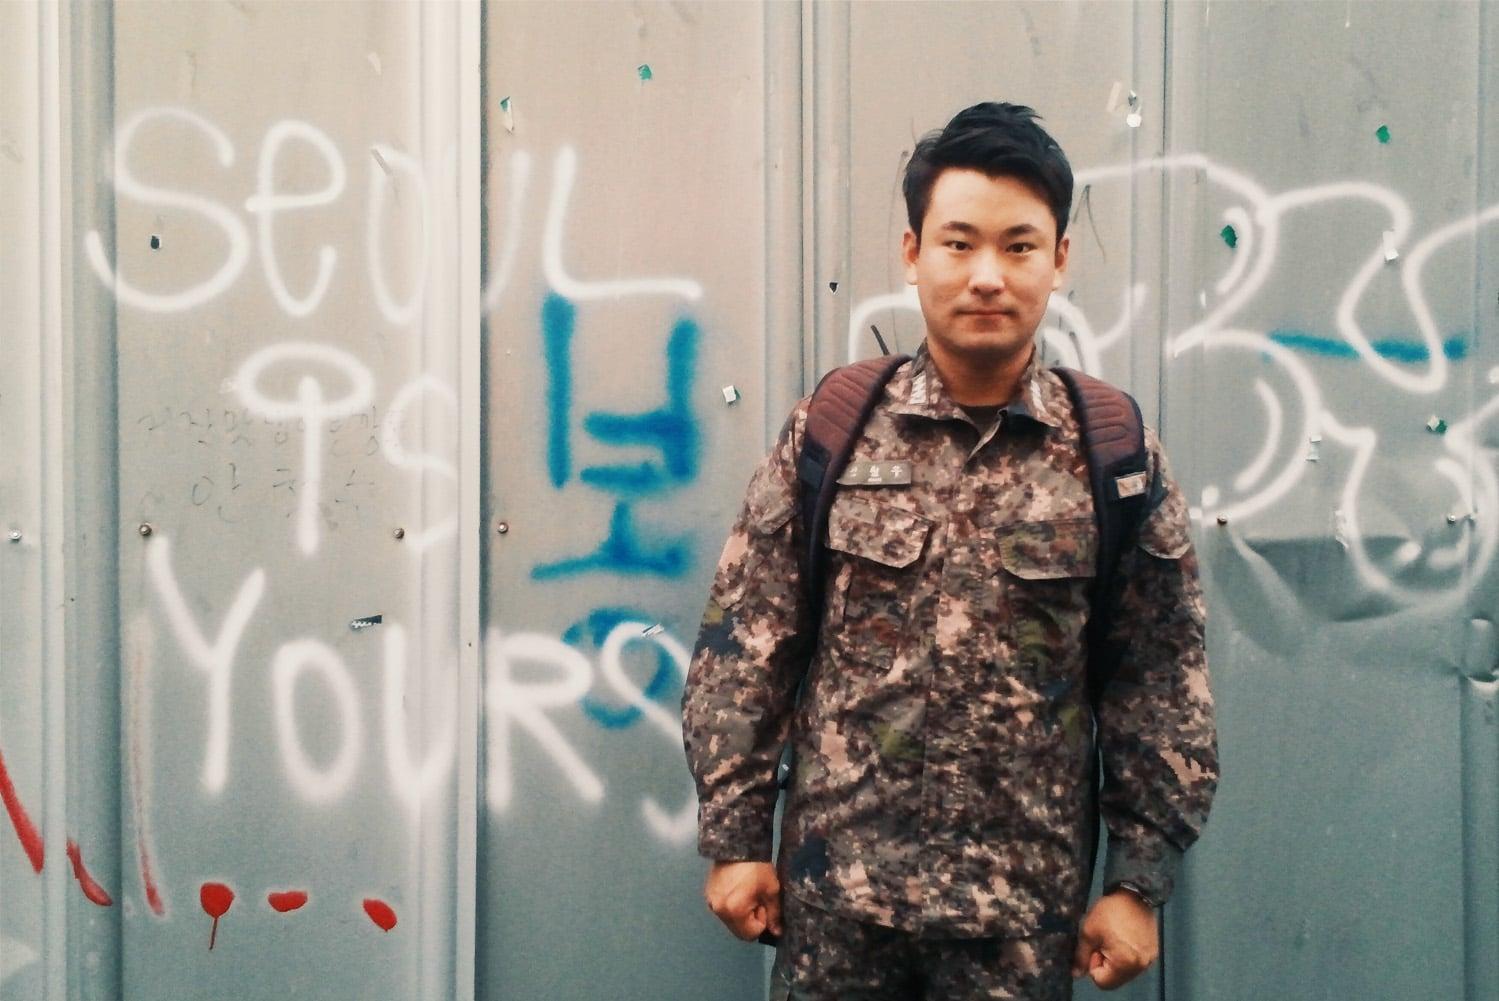 JH-20140912-SouthKorea-Day30.jpg